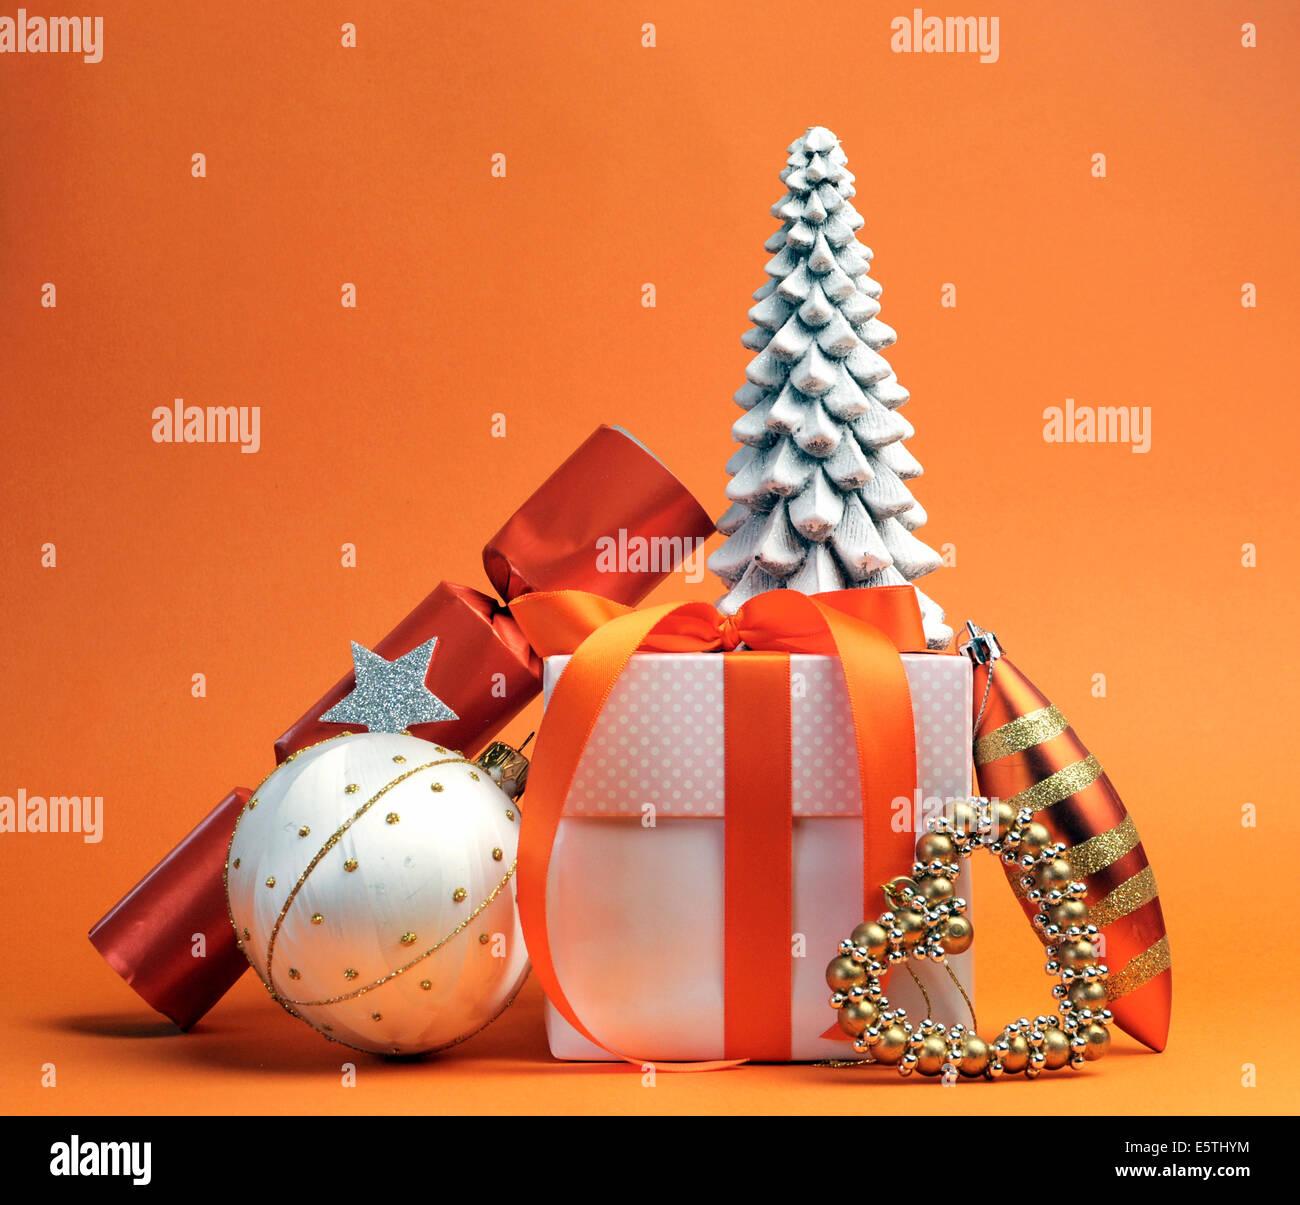 Orange Theme Christmas Tree Gift High Resolution Stock Photography And Images Alamy